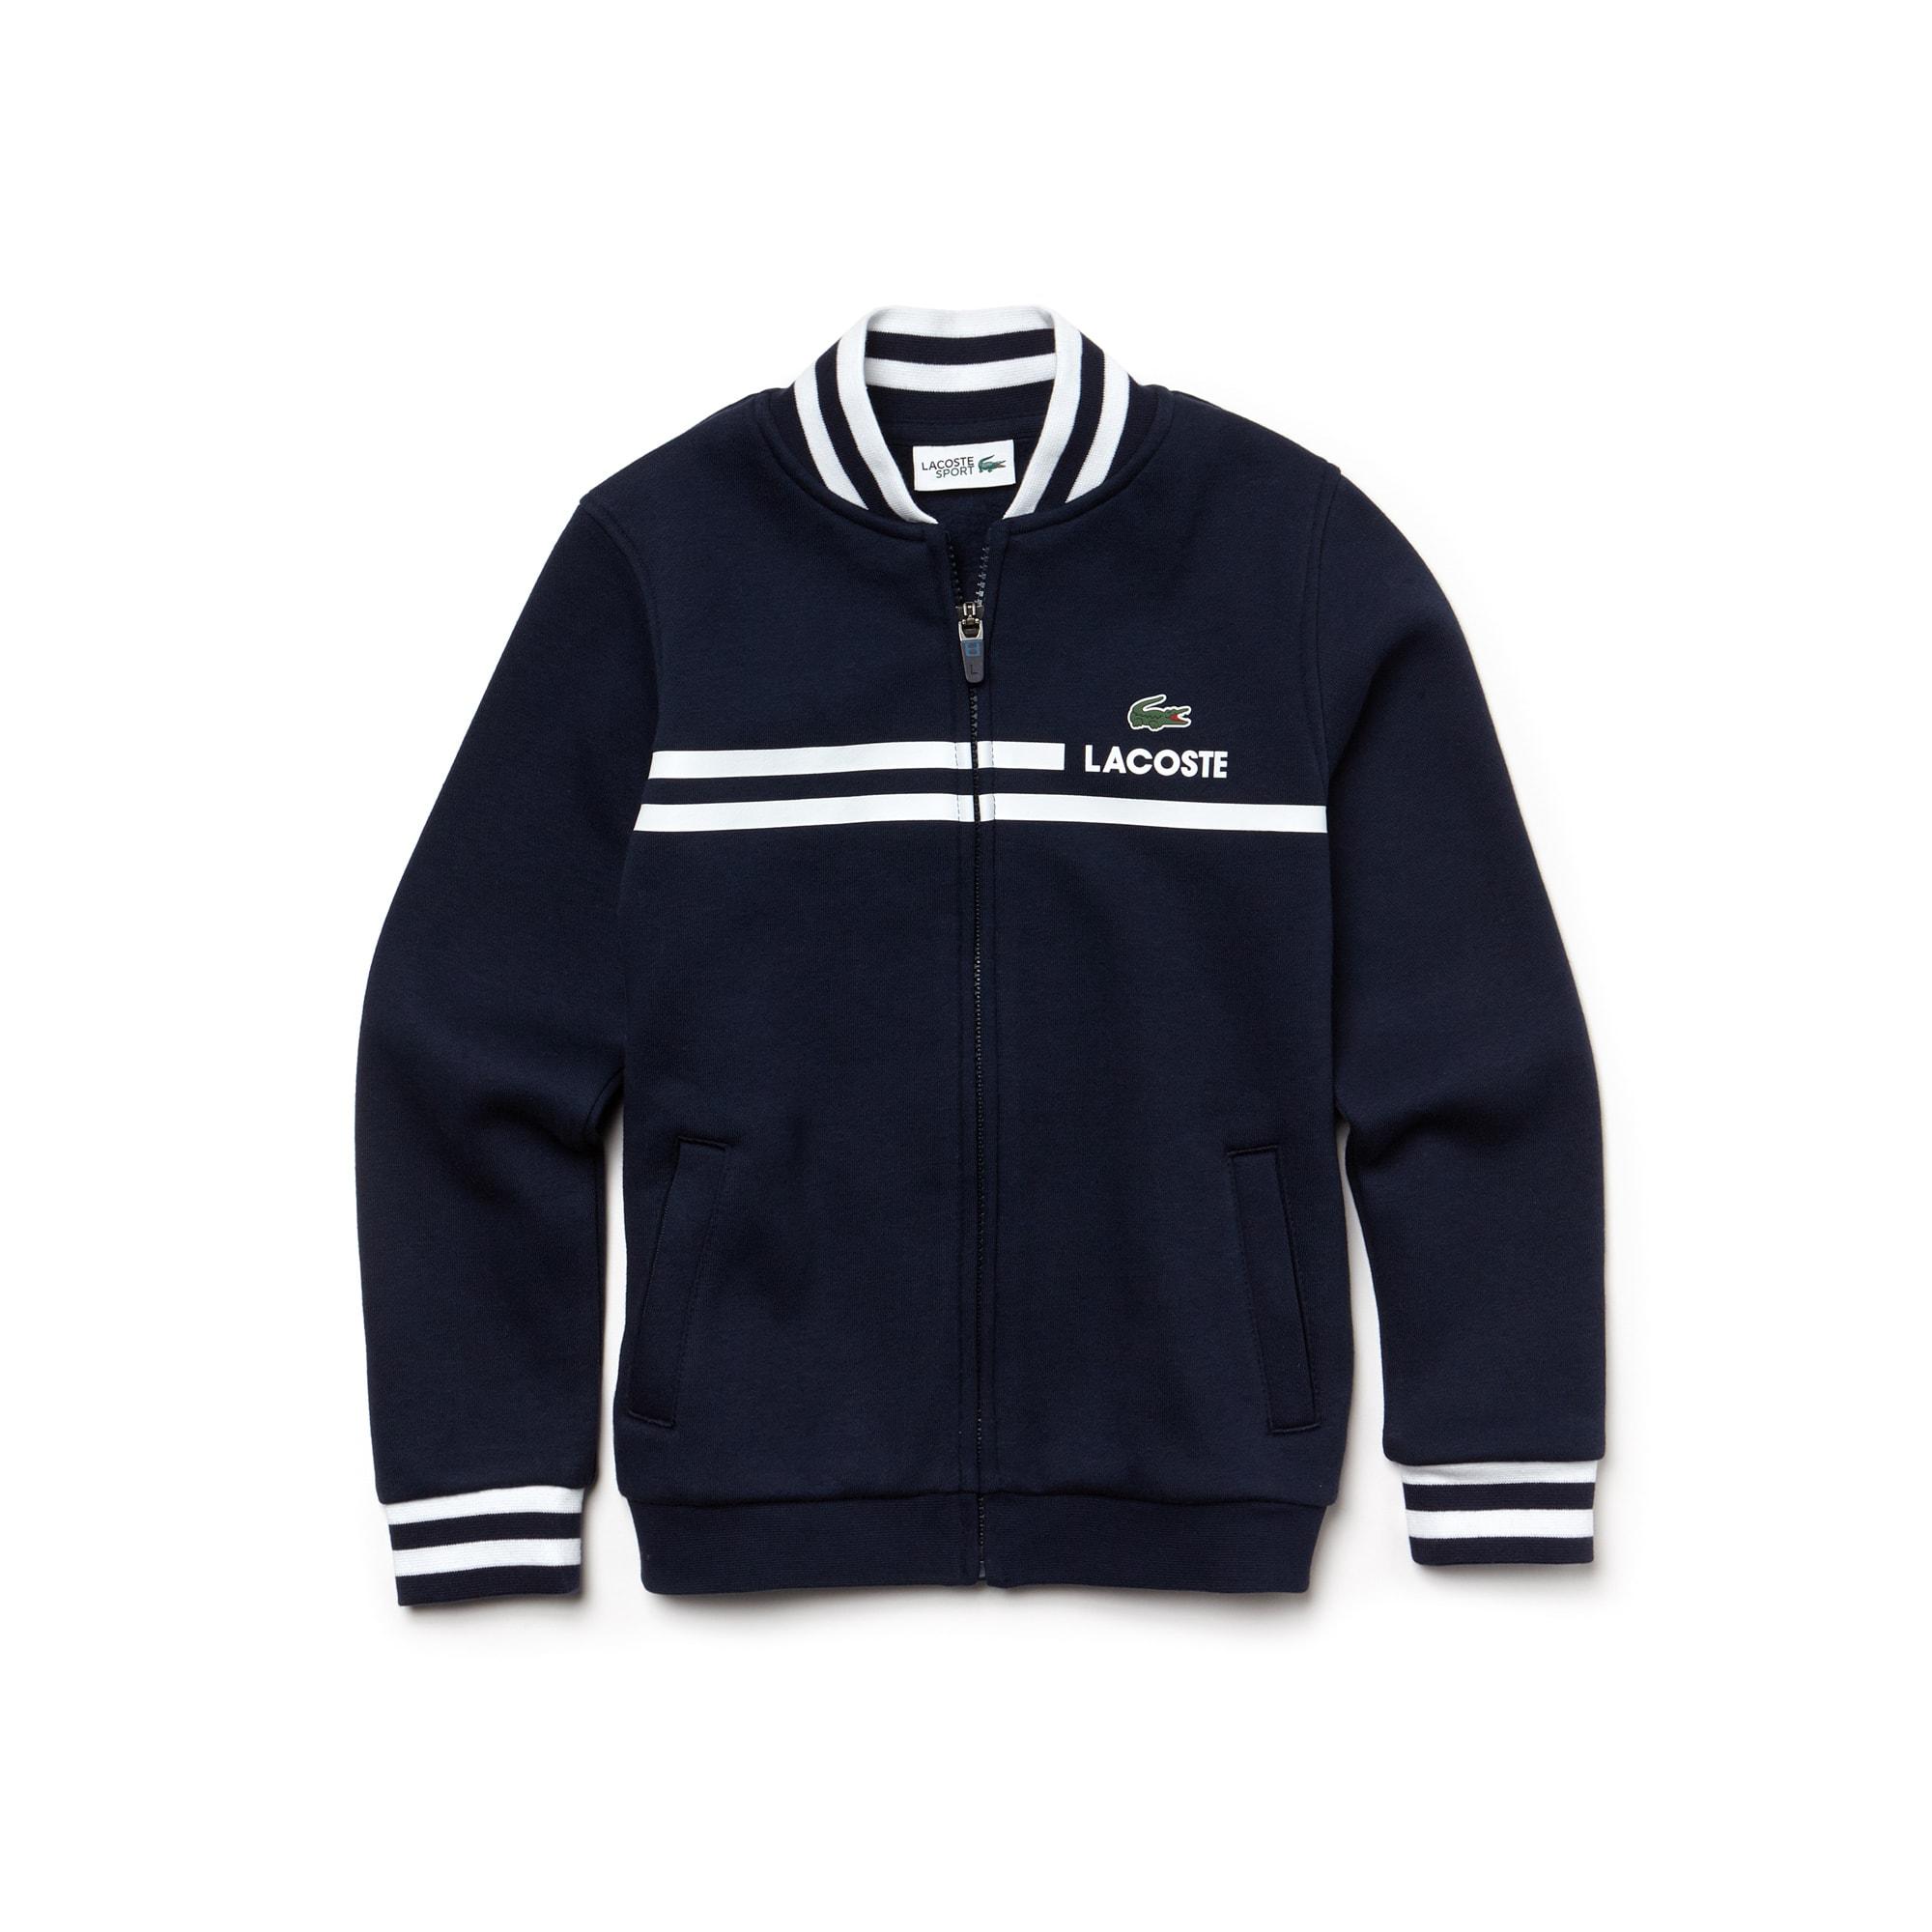 Boys' Lacoste SPORT Zippered Fleece Tennis Sweatshirt